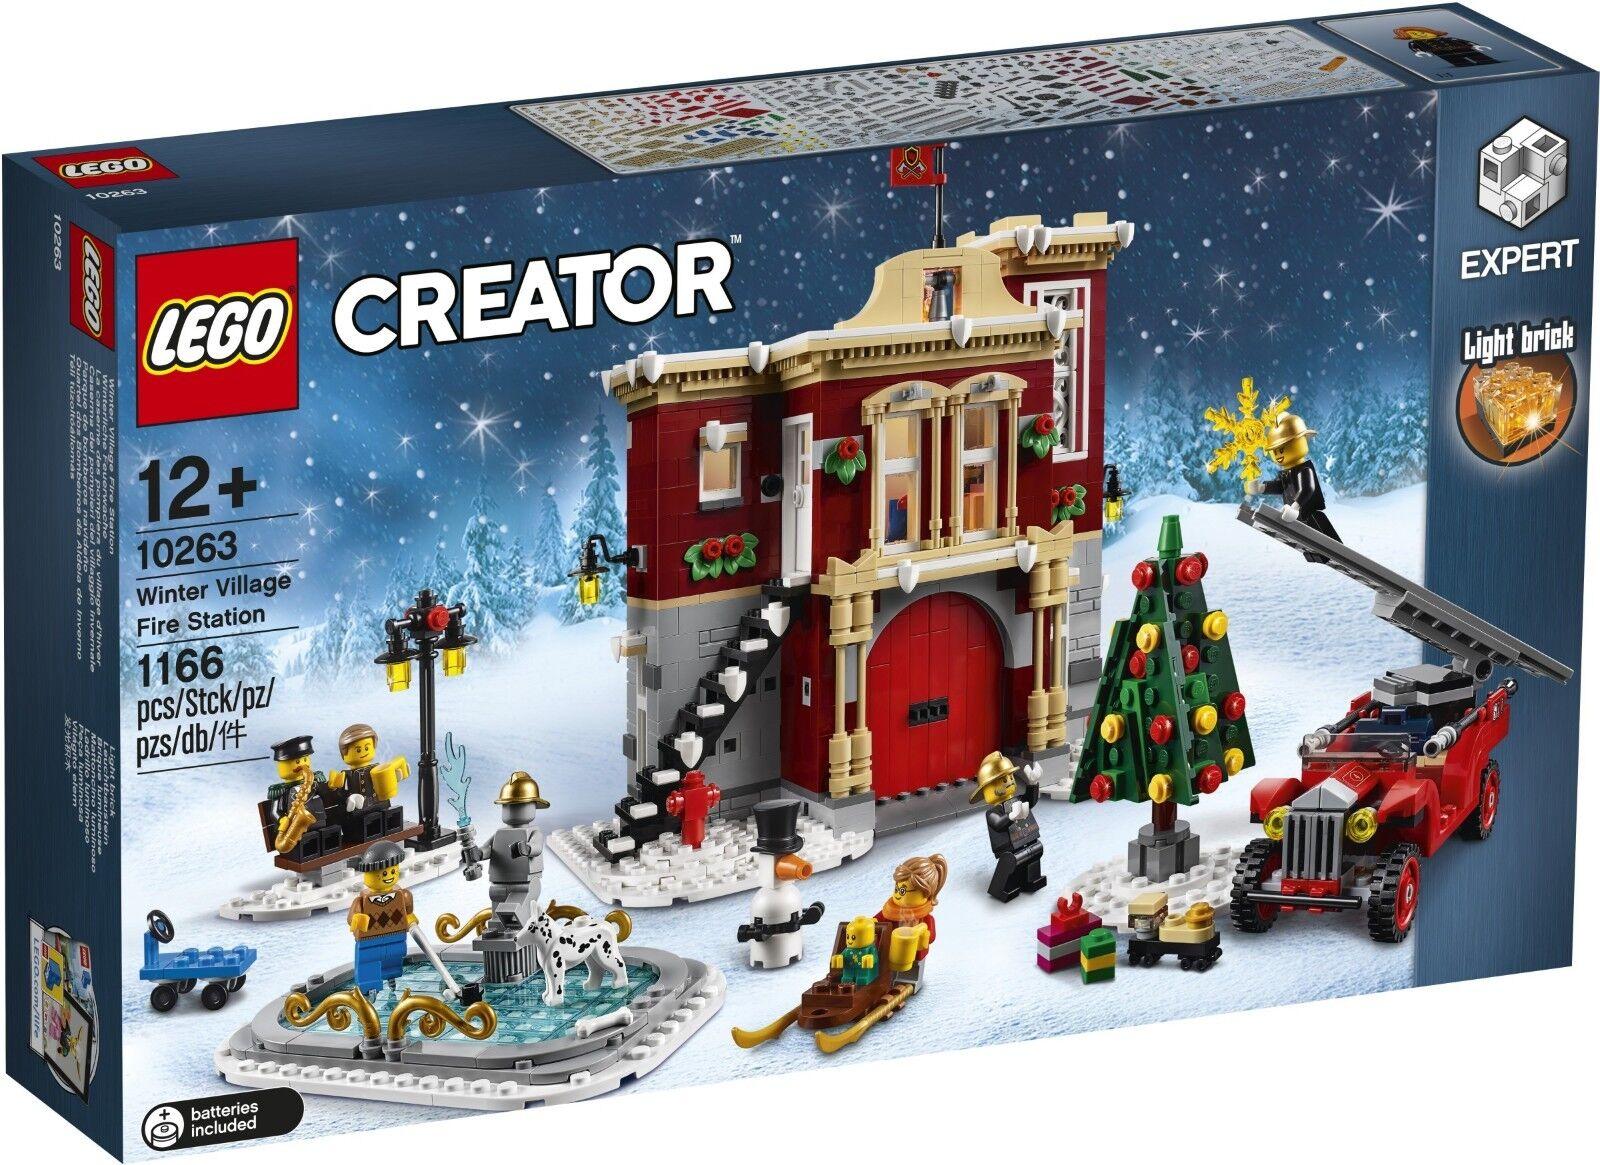 Lego 10263 - Creator Expert - Winter Village Fire Station - MISB - New